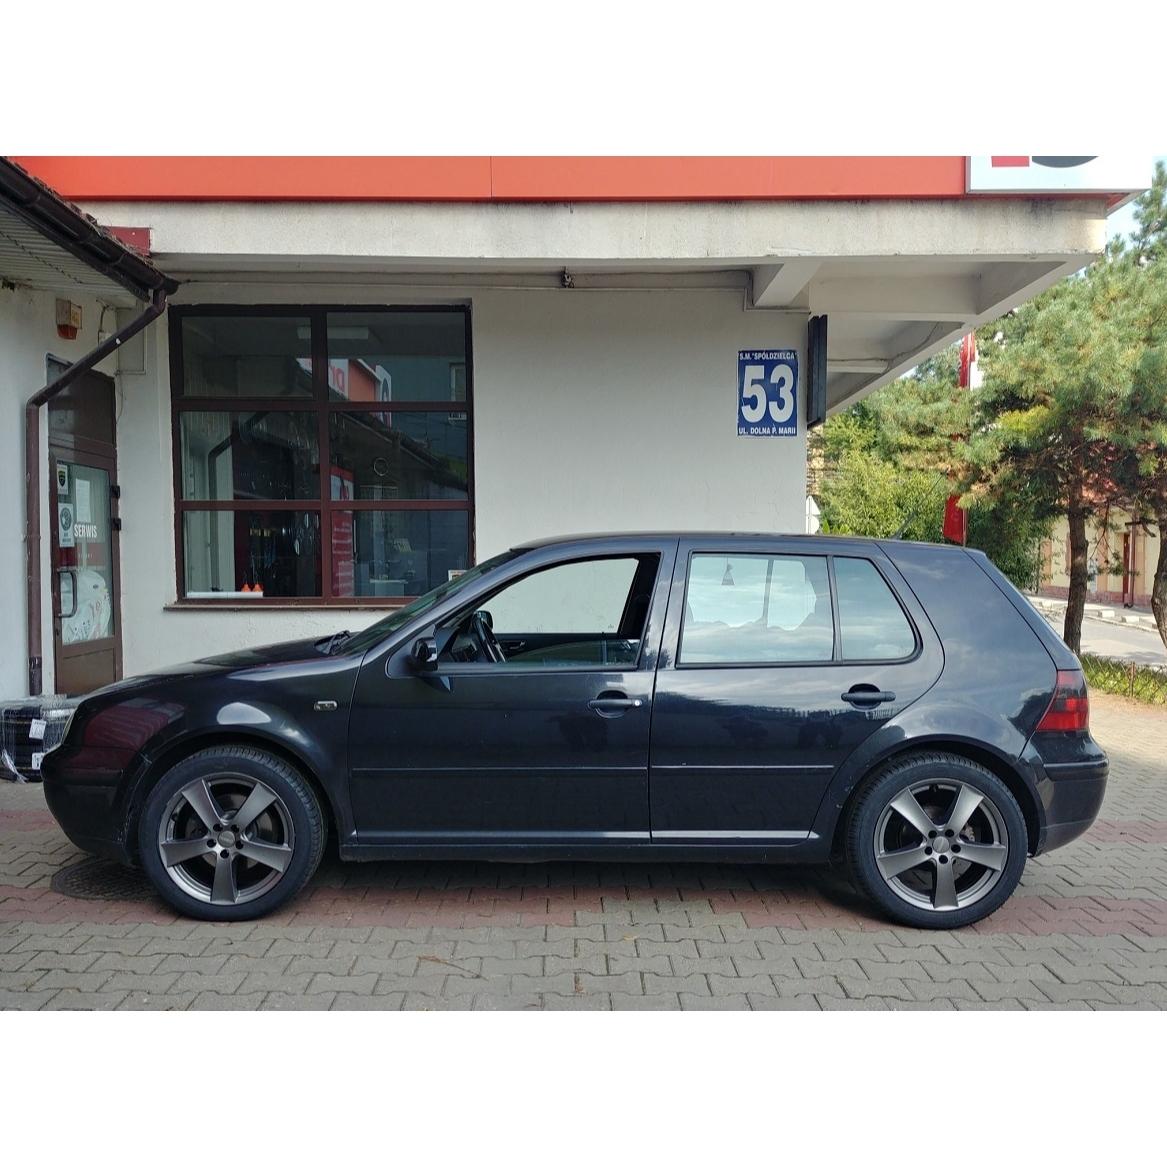 Car-But Kocoń i Jabłoński Sp J